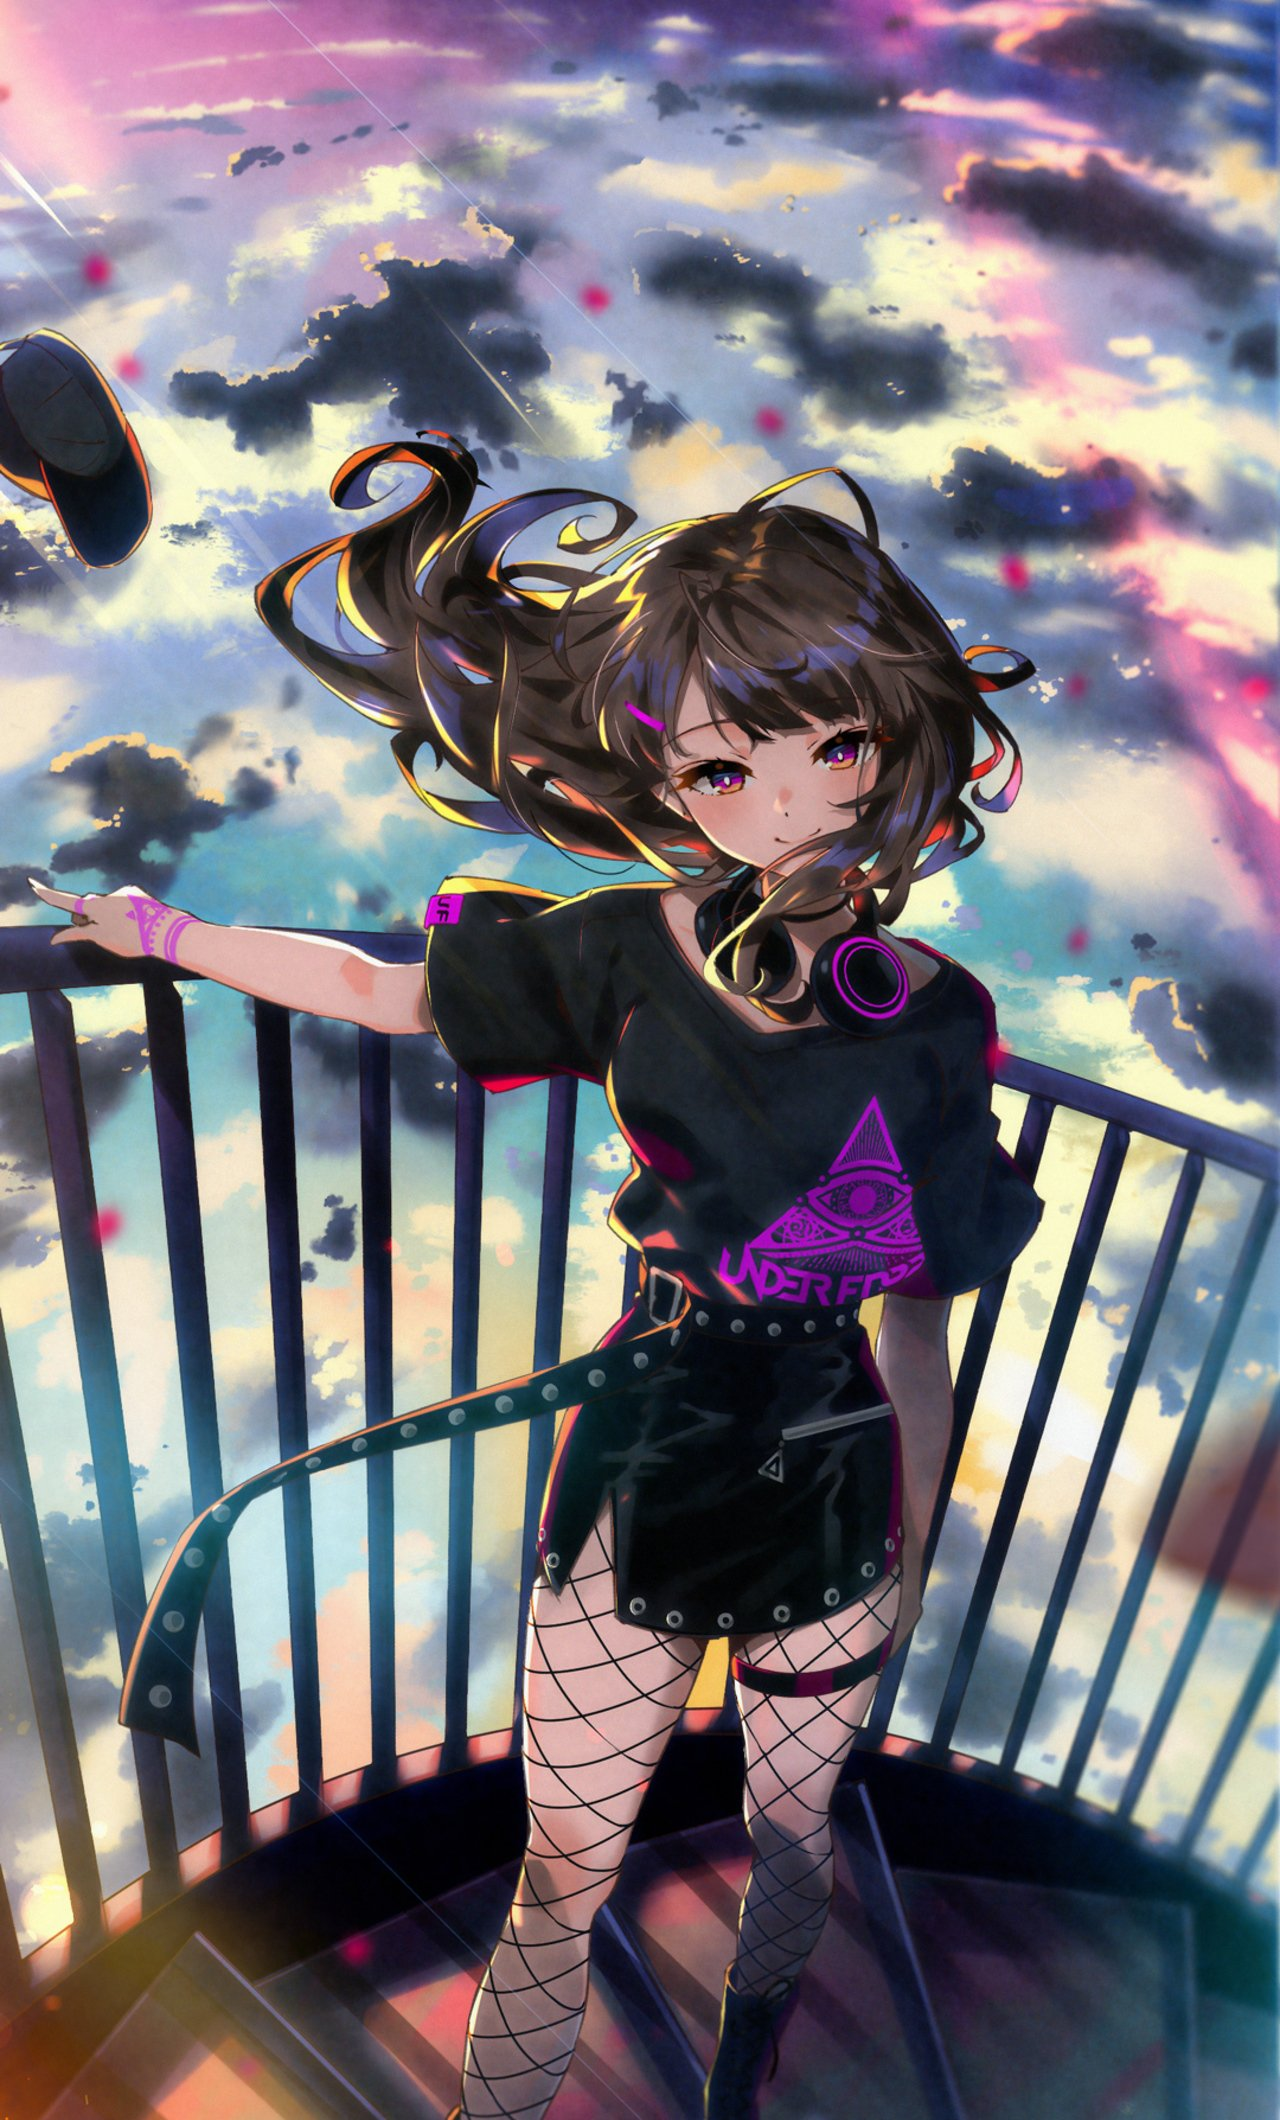 55 Anime Iphone 11 4k Wallpapers On Wallpapersafari